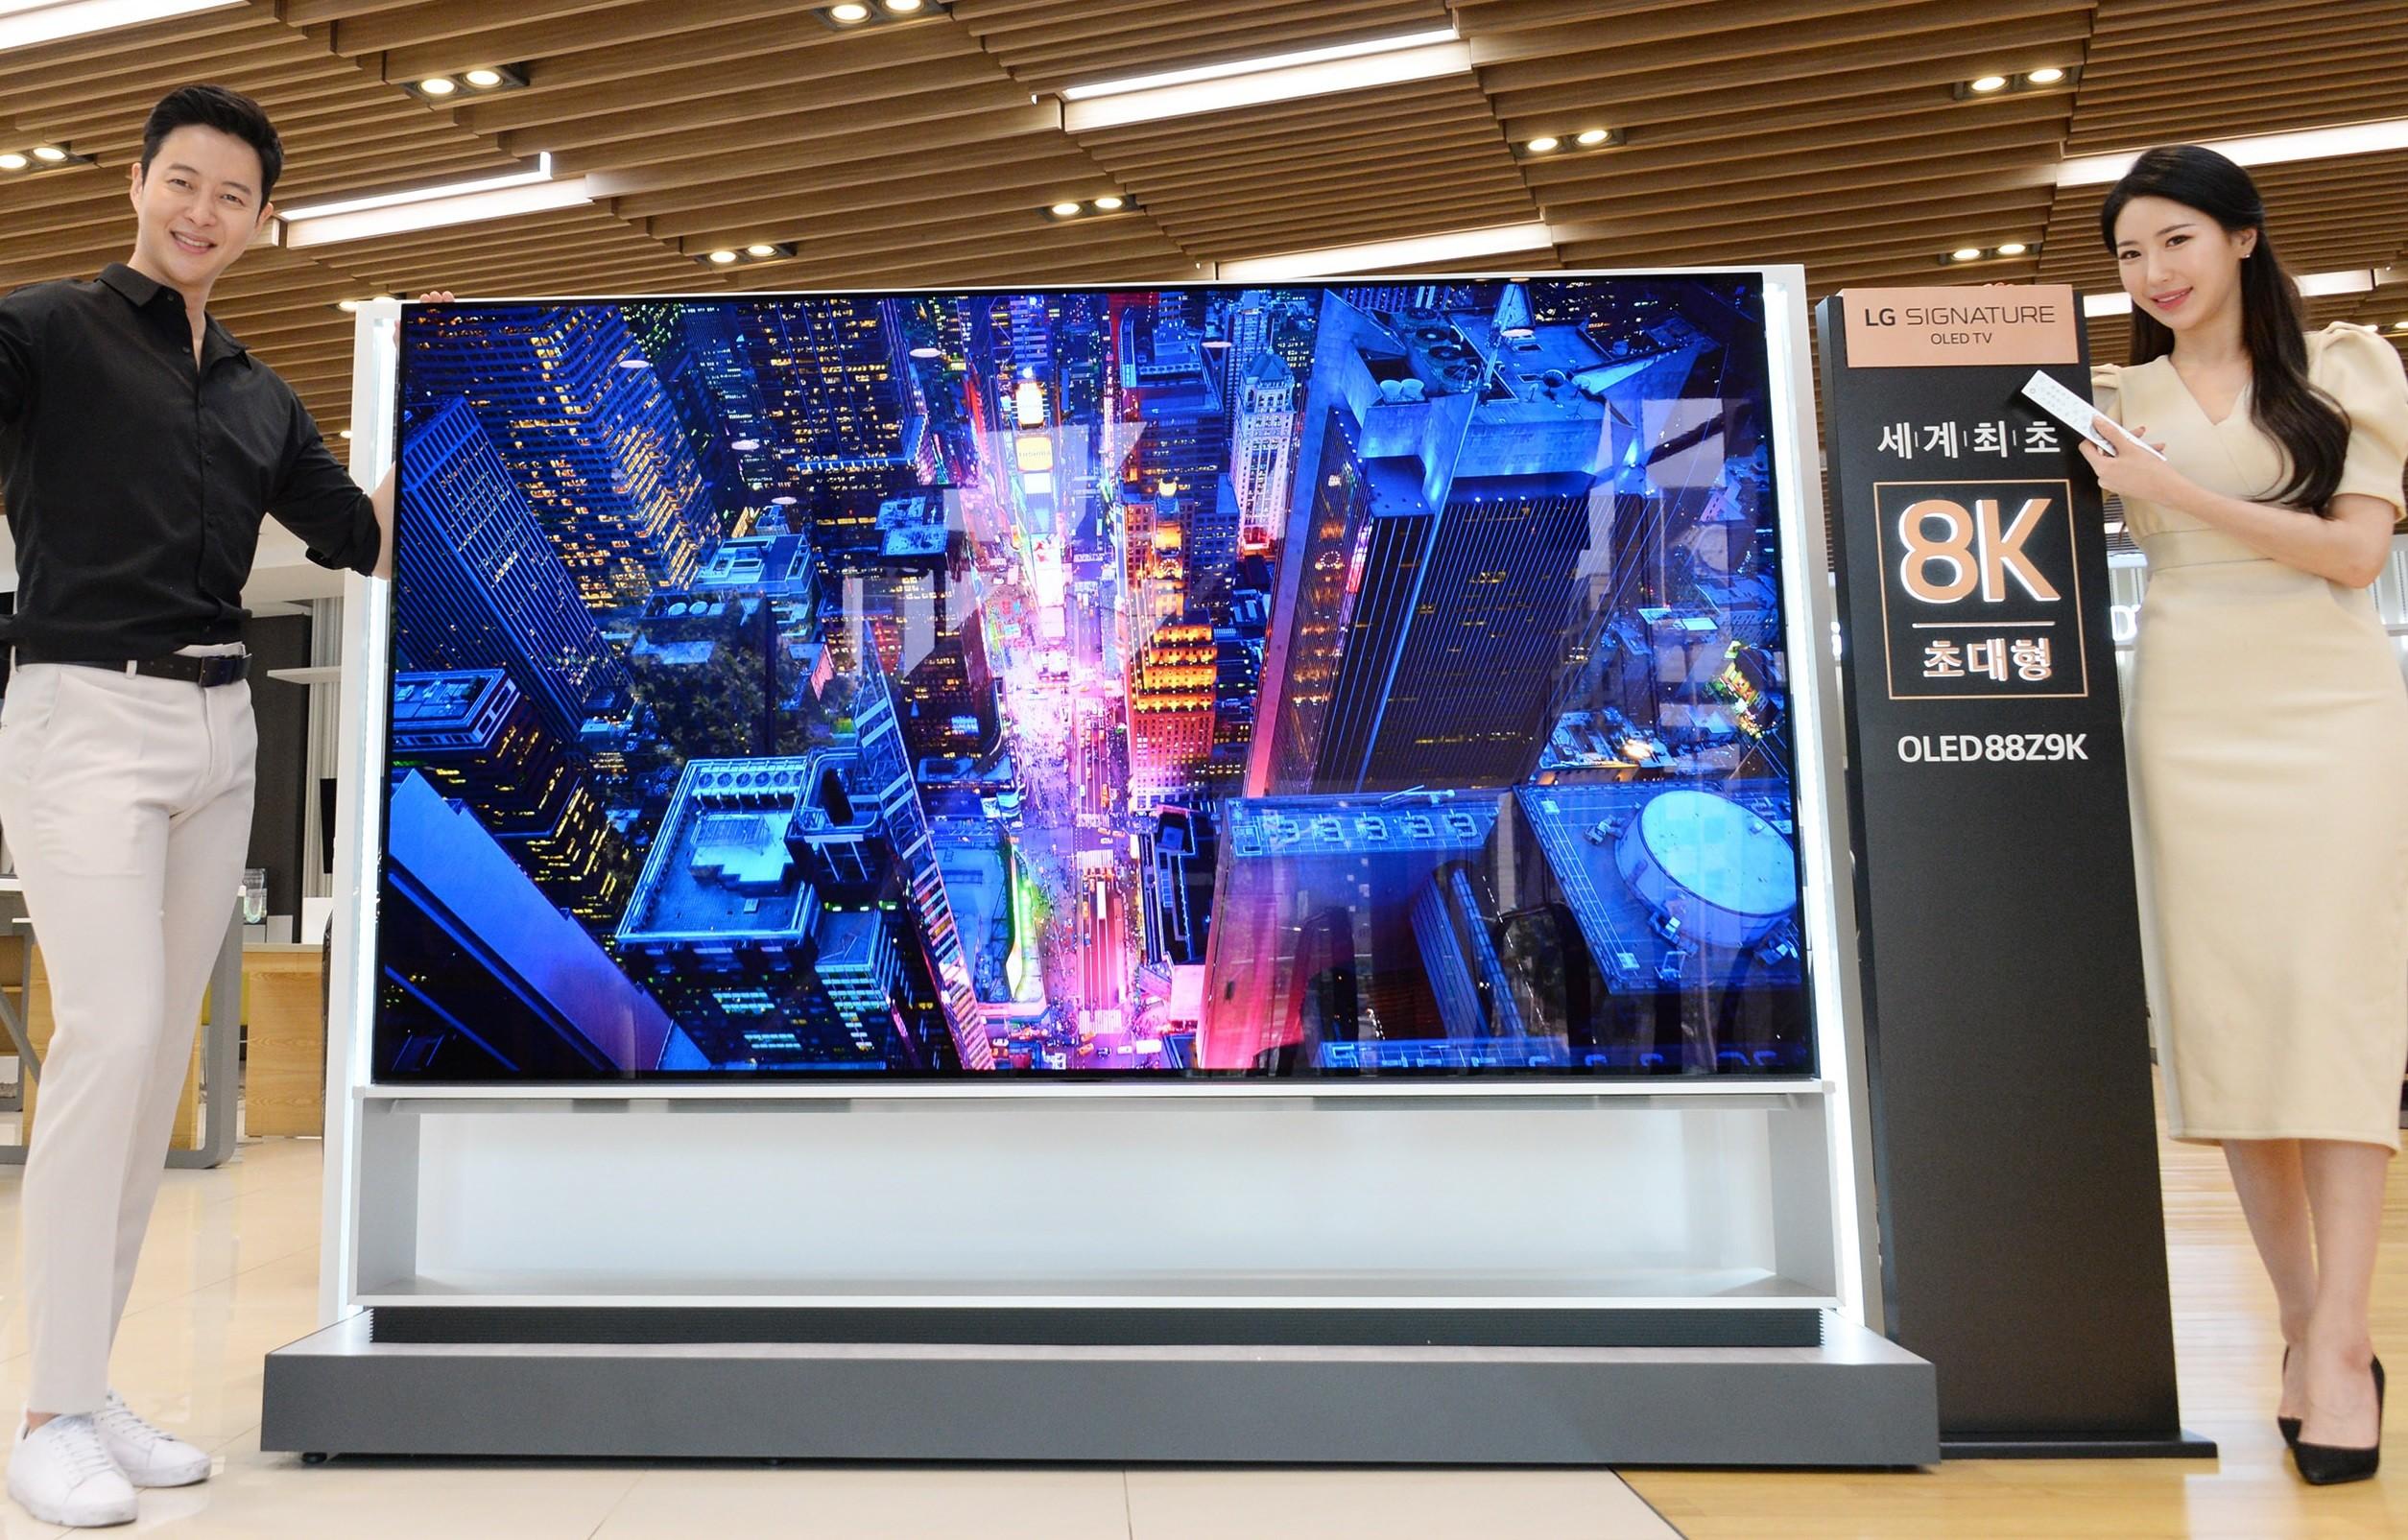 Media asset in full size related to 3dfxzone.it news item entitled as follows: LG commercializza il primo televisore al mondo 8K OLED con diagonale da 88-inch | Image Name: news29654_LG-8K-OLED-88Z9_1.jpg